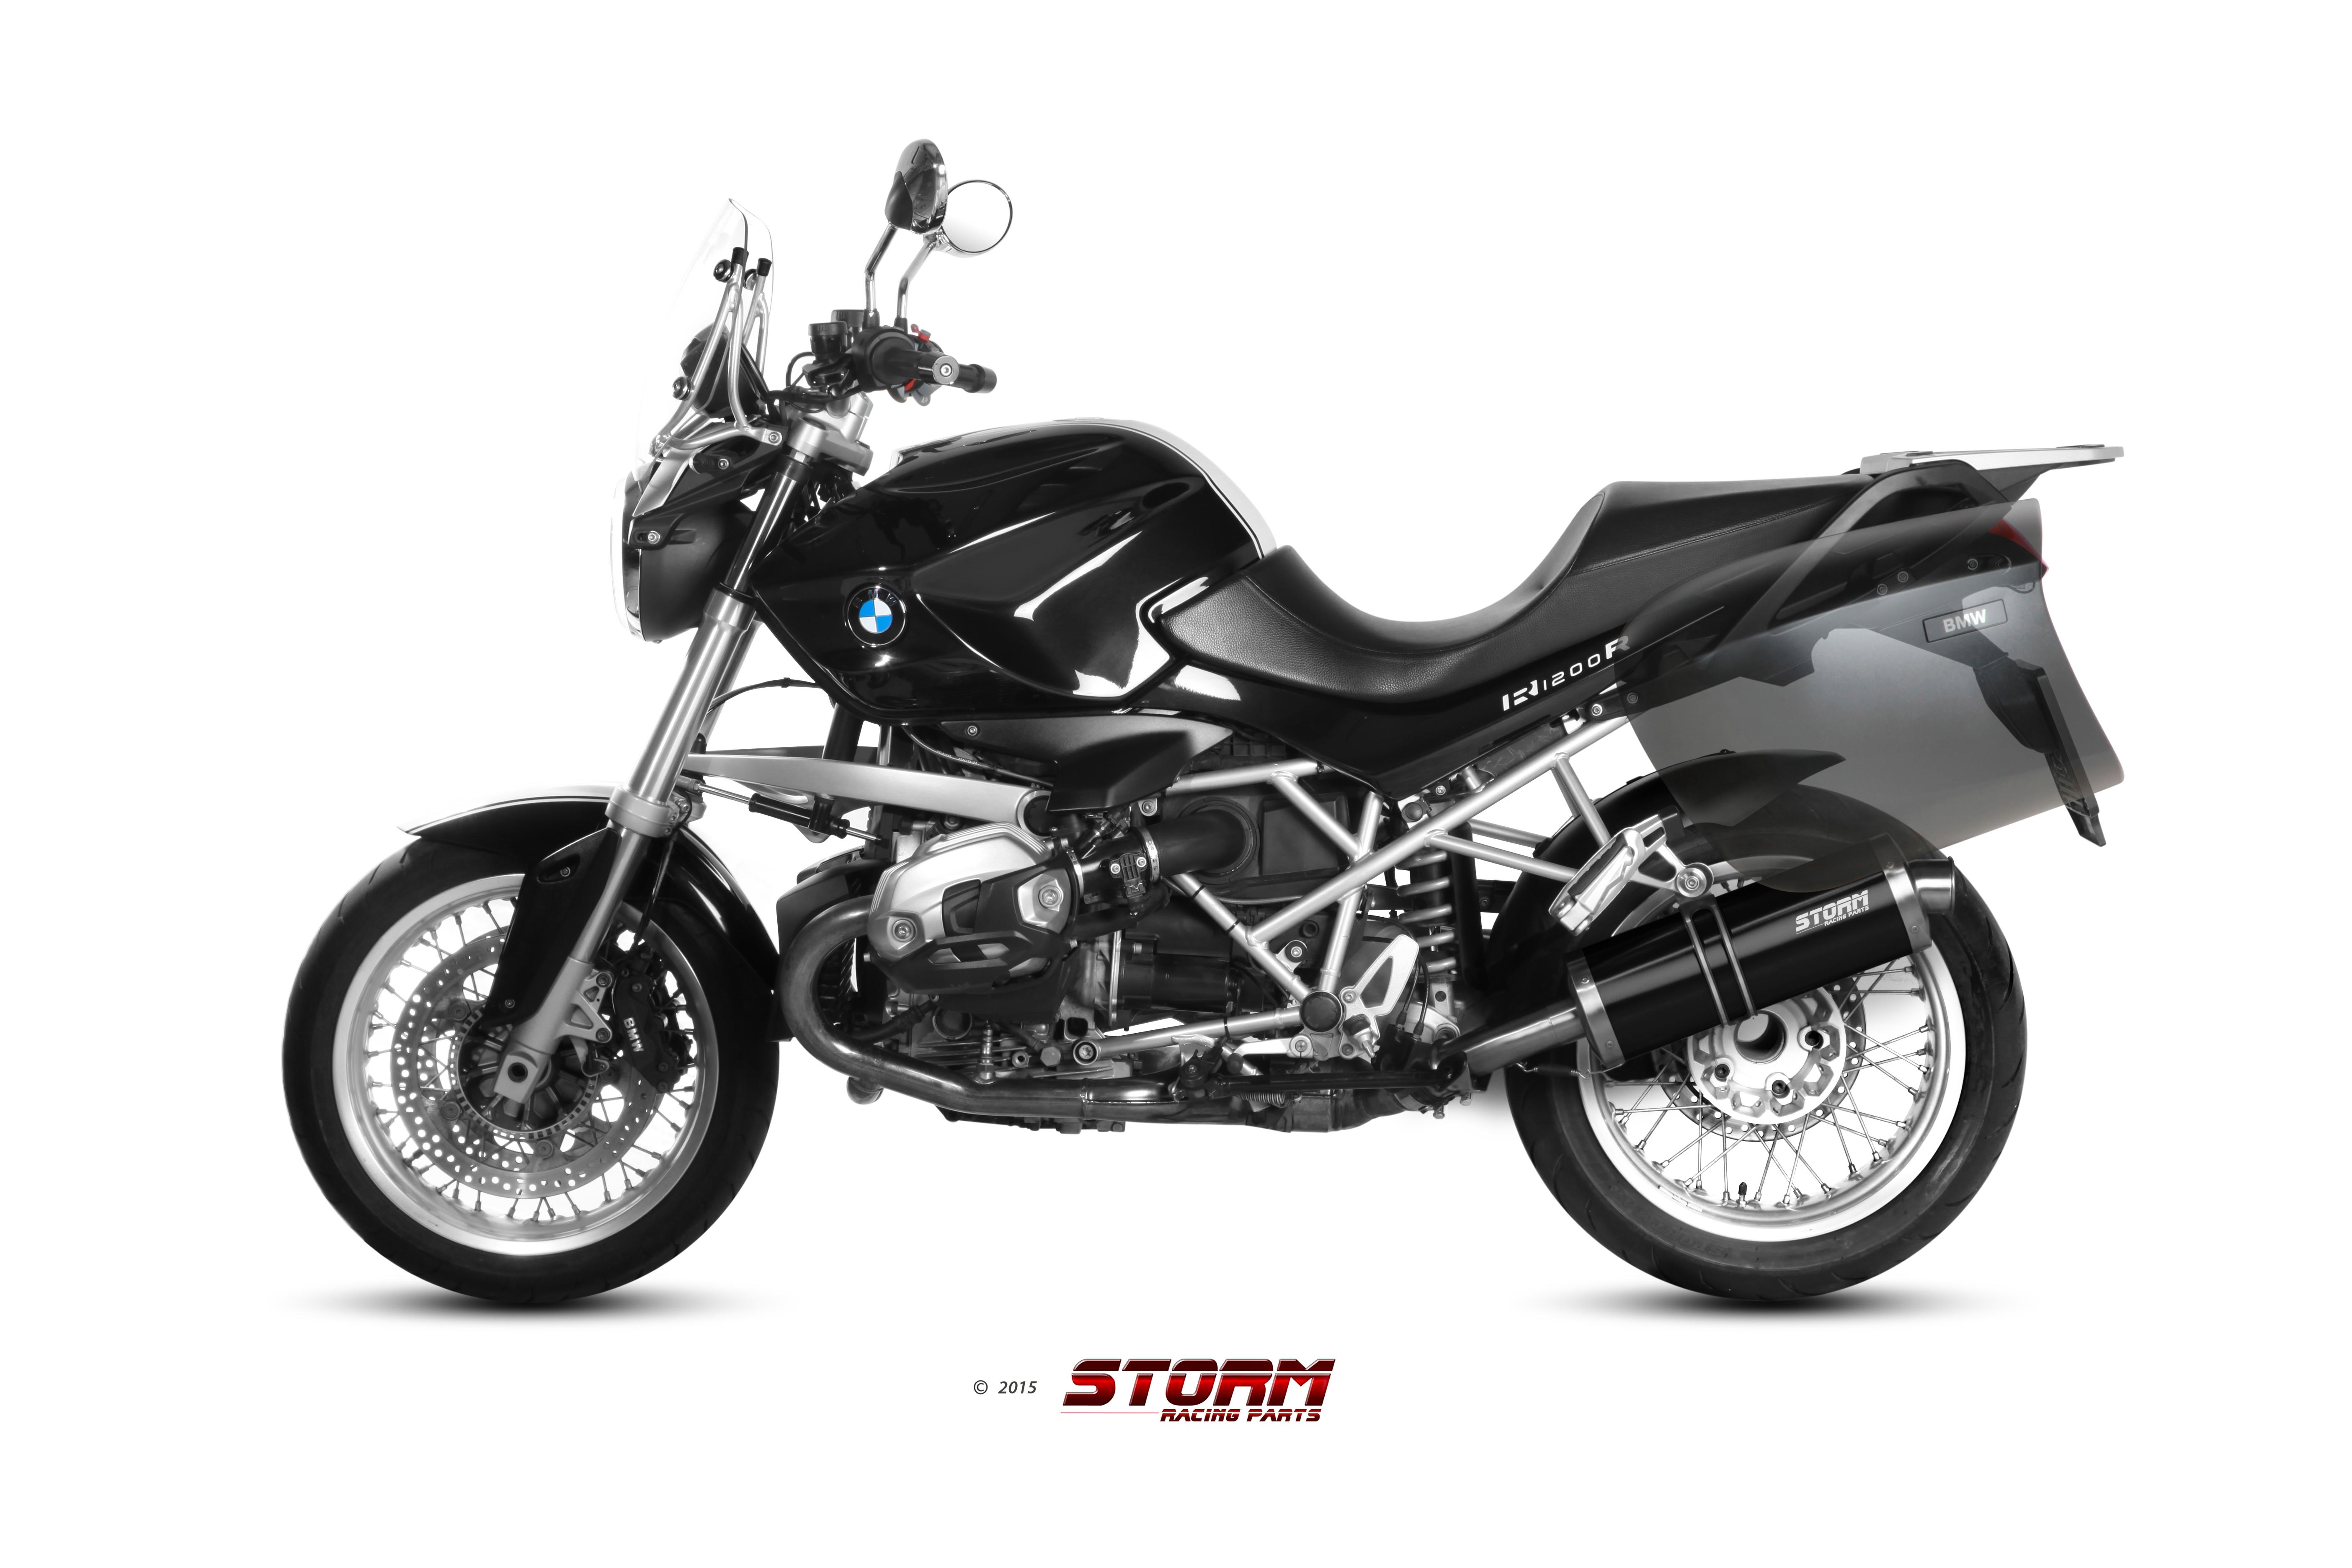 BMW R 1200 R Exhaust Storm Oval Black stainless steel B.028.LX2B